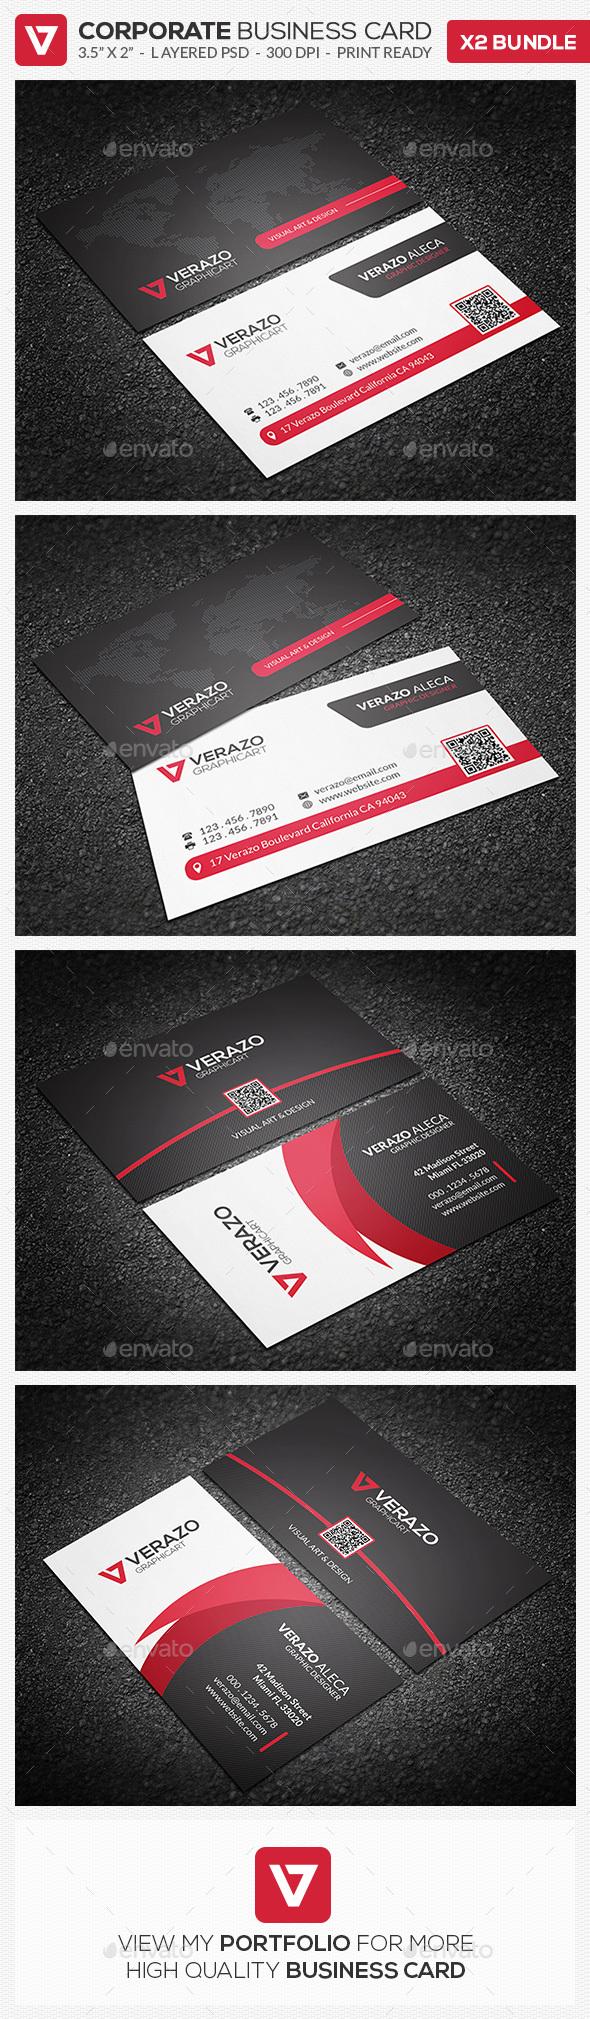 Business Card Bundle 23 - Corporate Business Cards